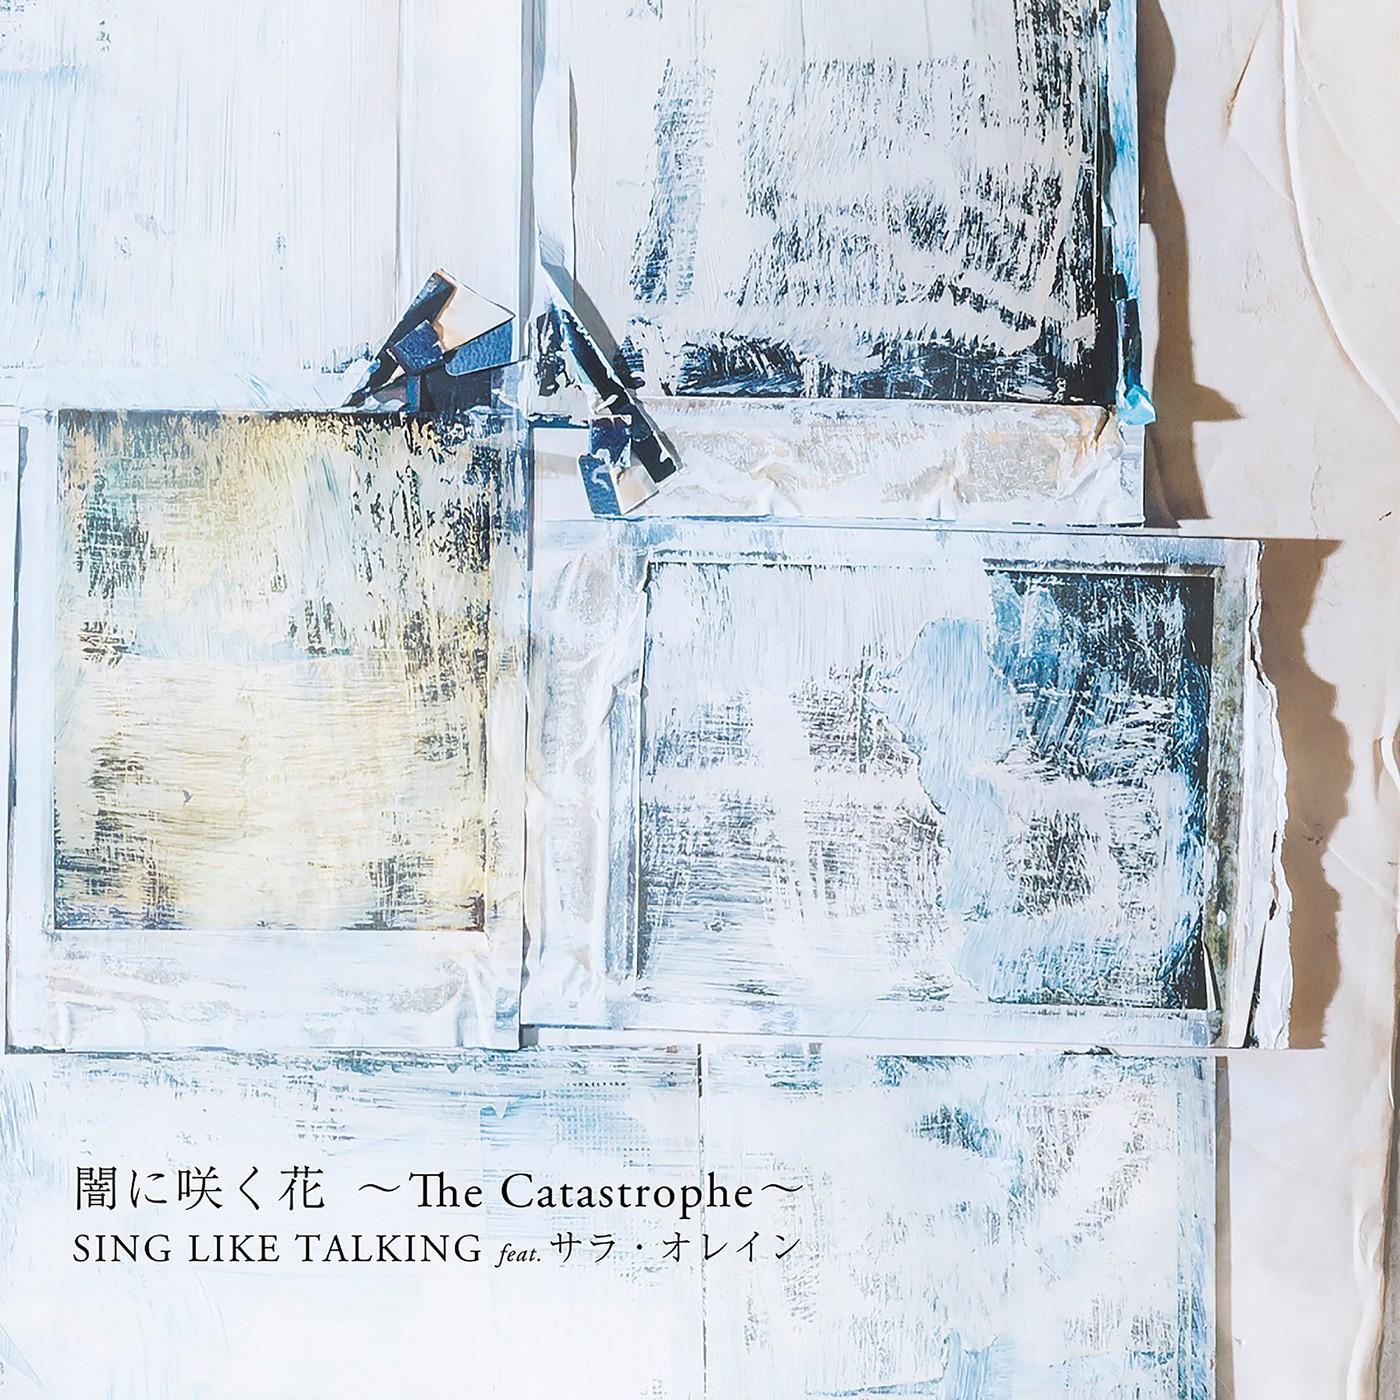 SING LIKE TALKING – 闇に咲く花 ~The Catastrophe~ [FLAC / 24bit Lossless / WEB] [2017.10.25]